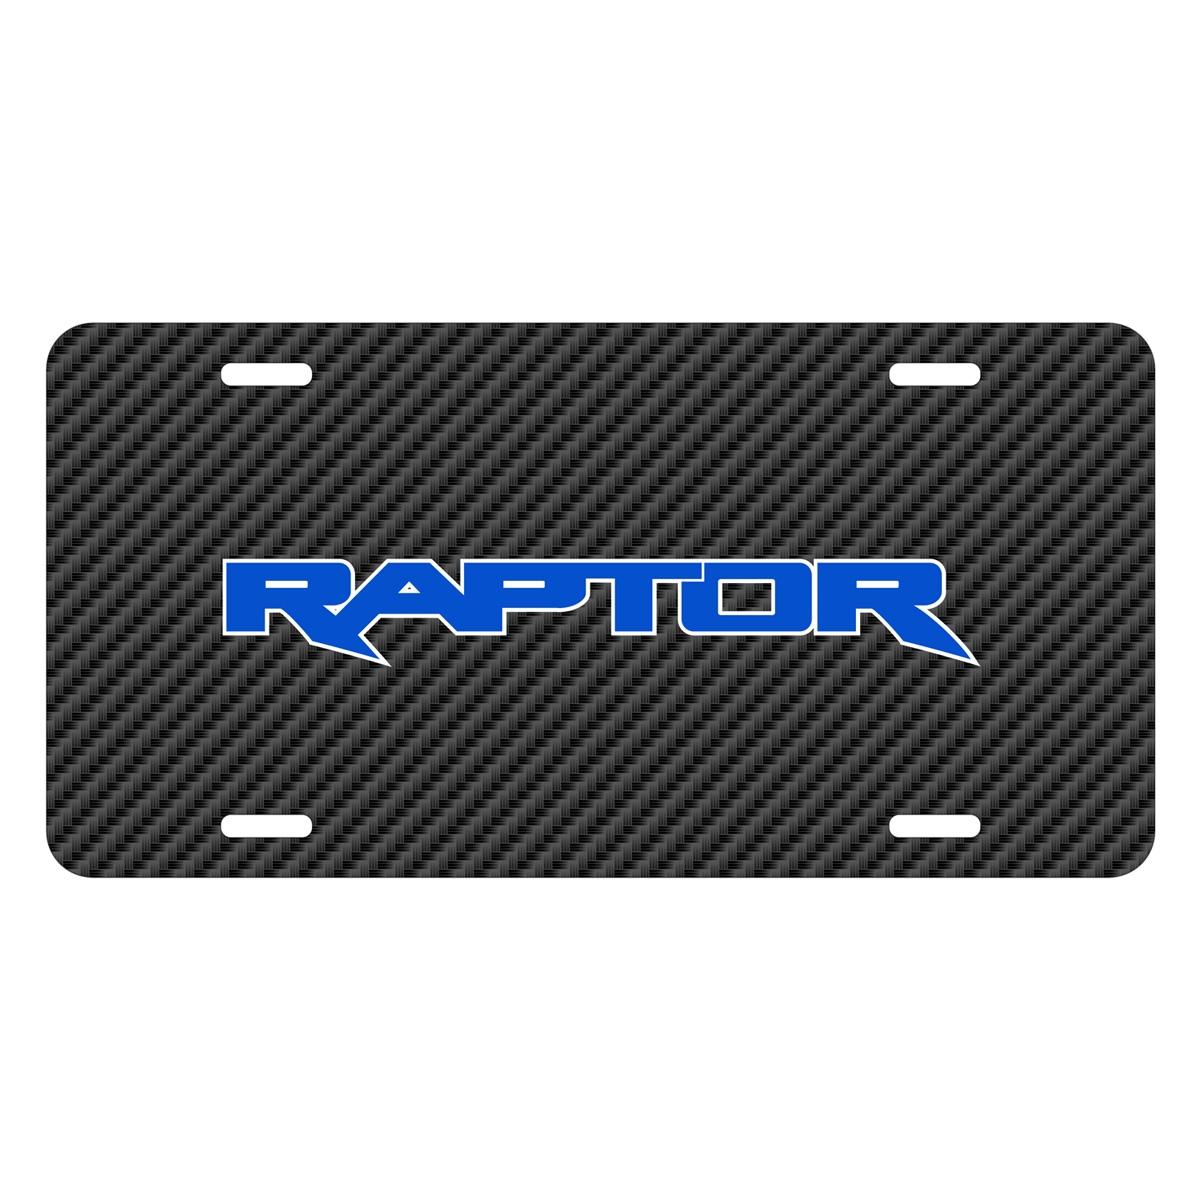 Ford F-150 Raptor 2017 in Blue Black Carbon Fiber Texture Graphic UV Metal License Plate